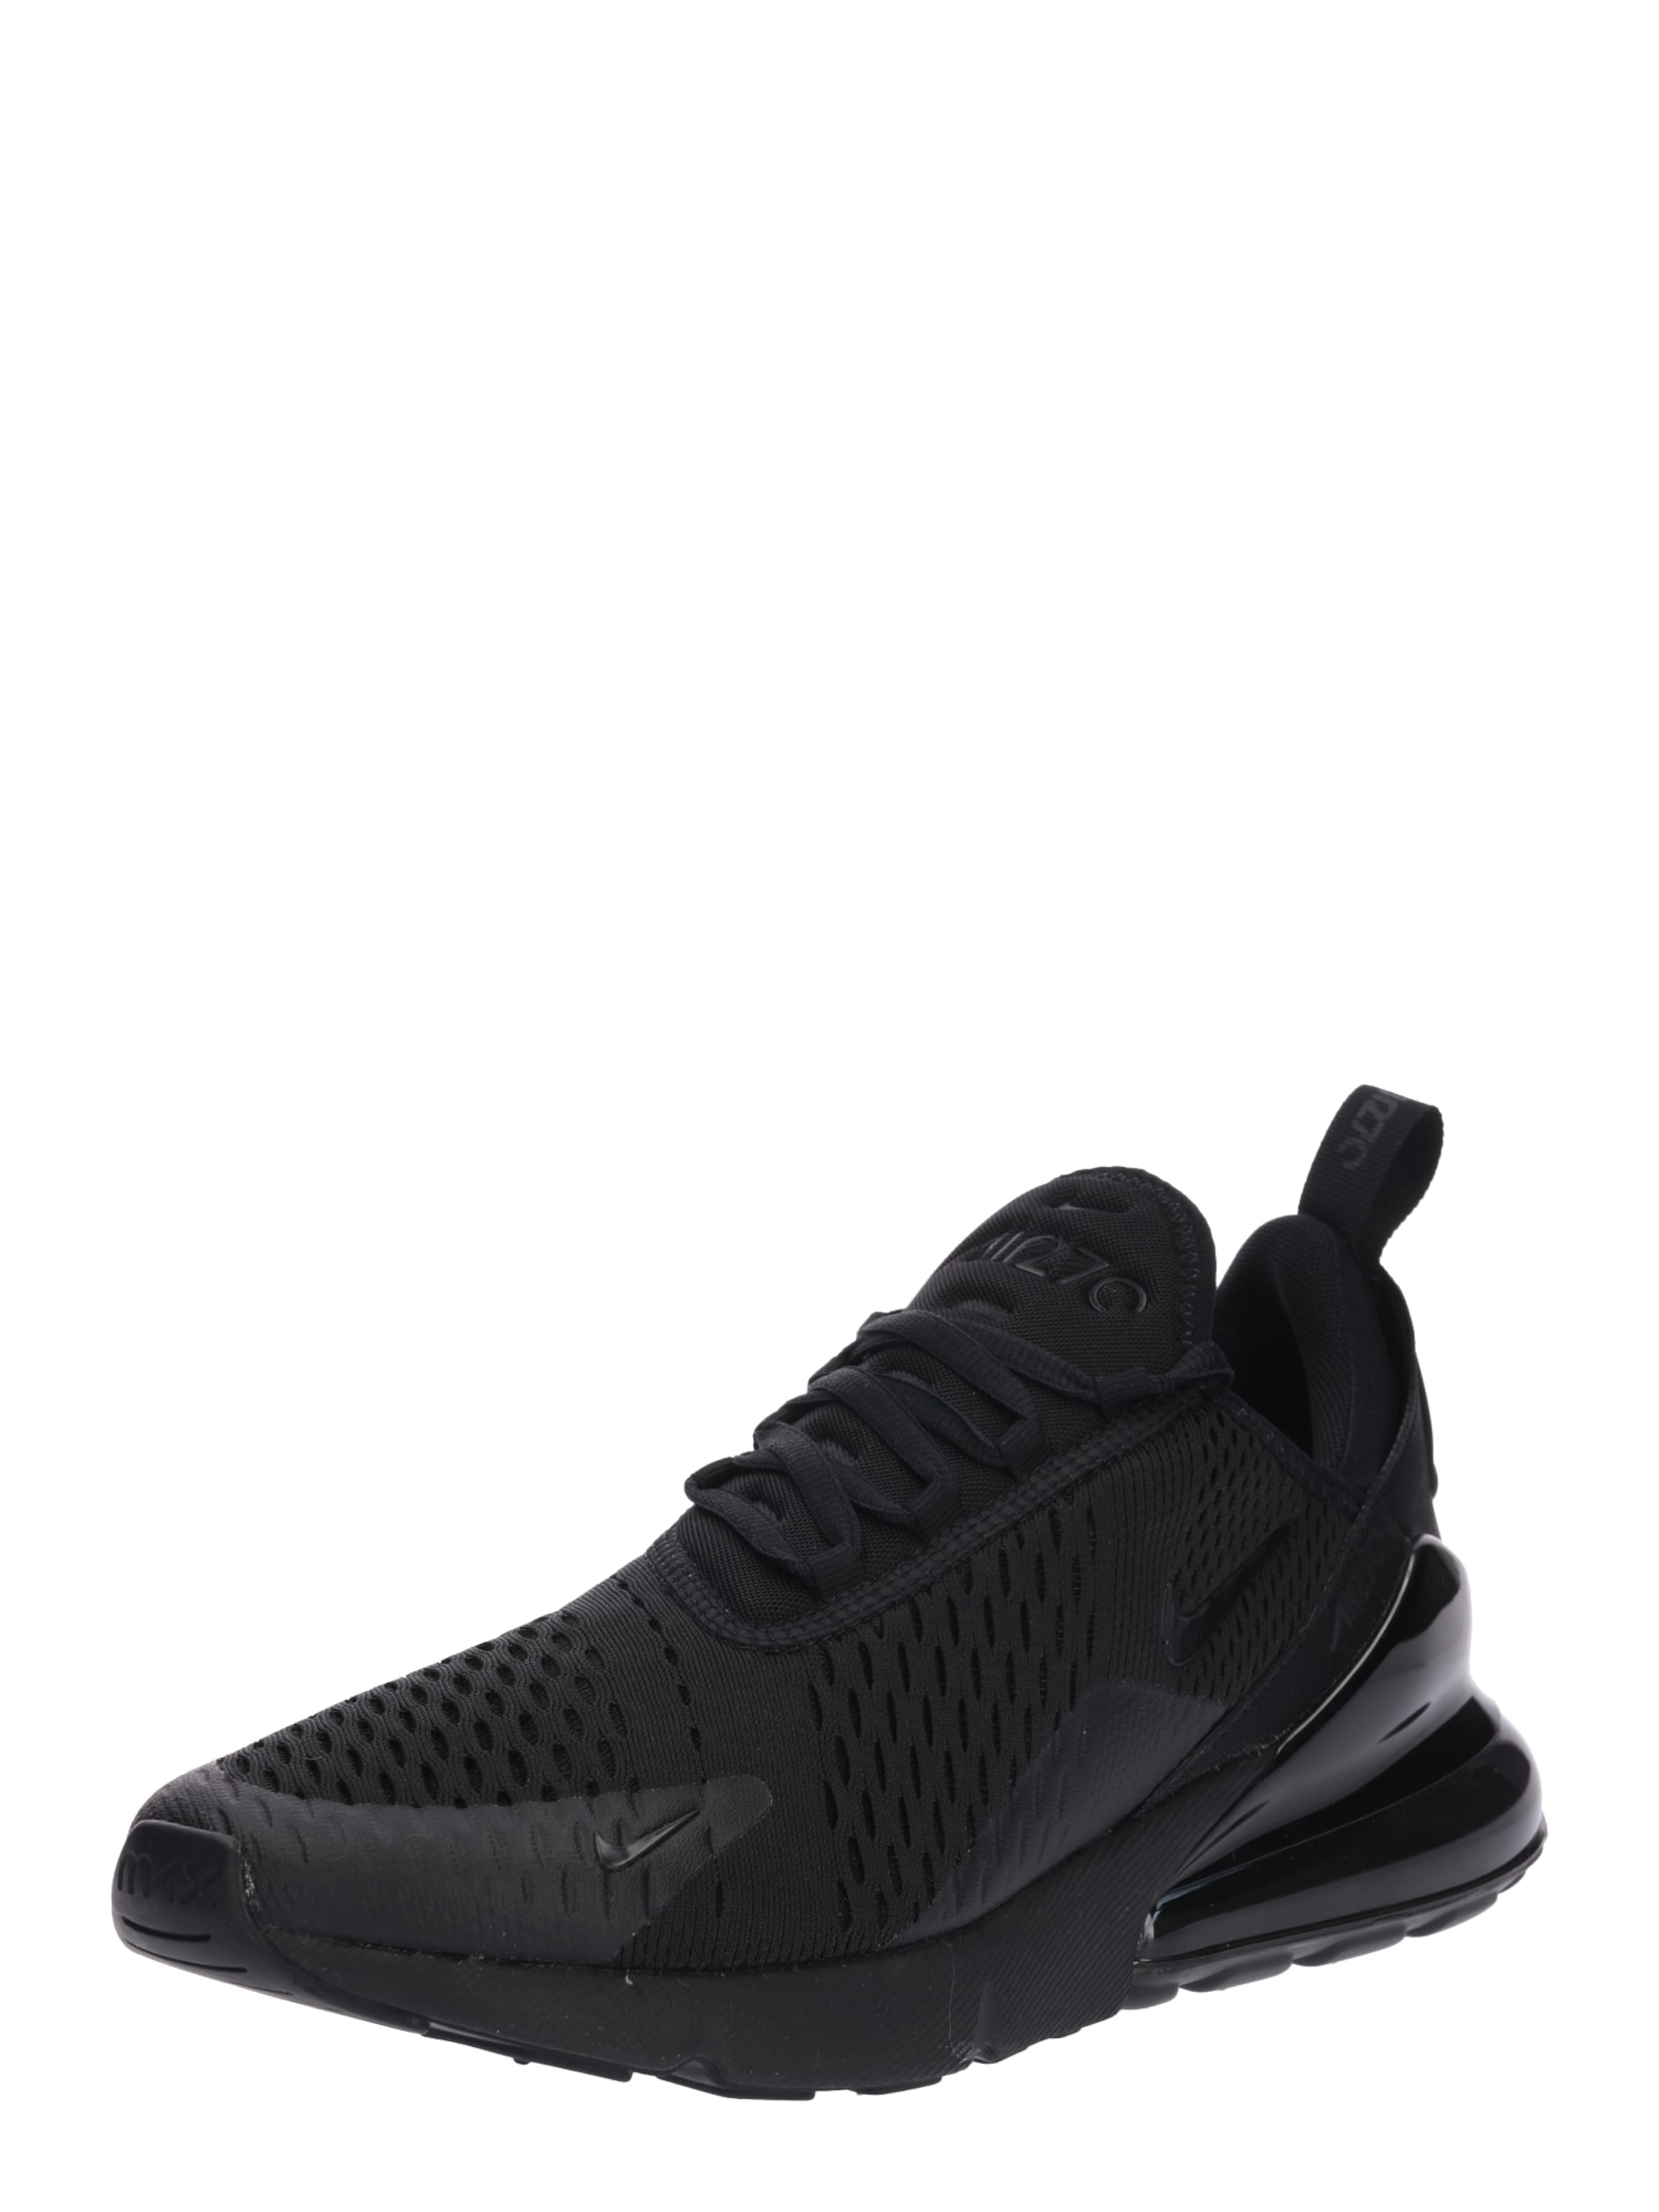 Nike In Max FuchsiaSchwarz Weiß Sneaker 'air 270' Sportswear xWdQBoerC